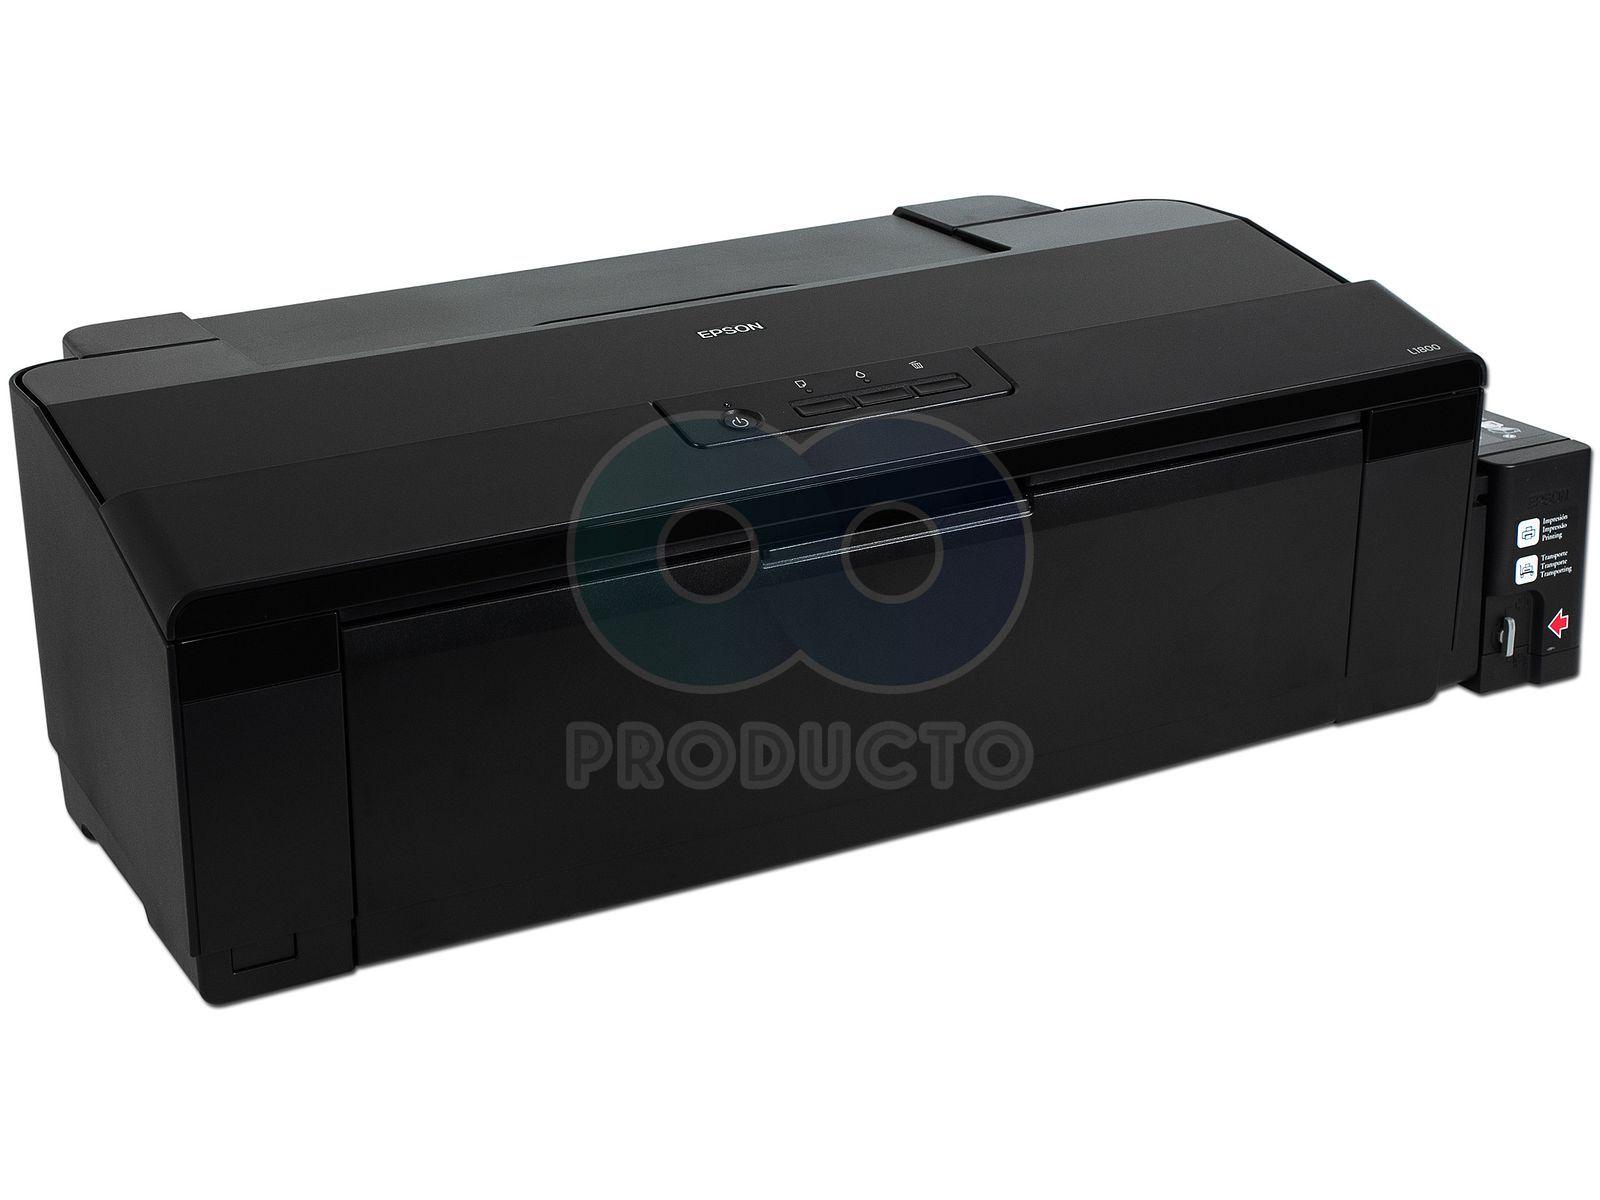 Impresora Epson Ecotank L1800 Con Sistema De Tanques De